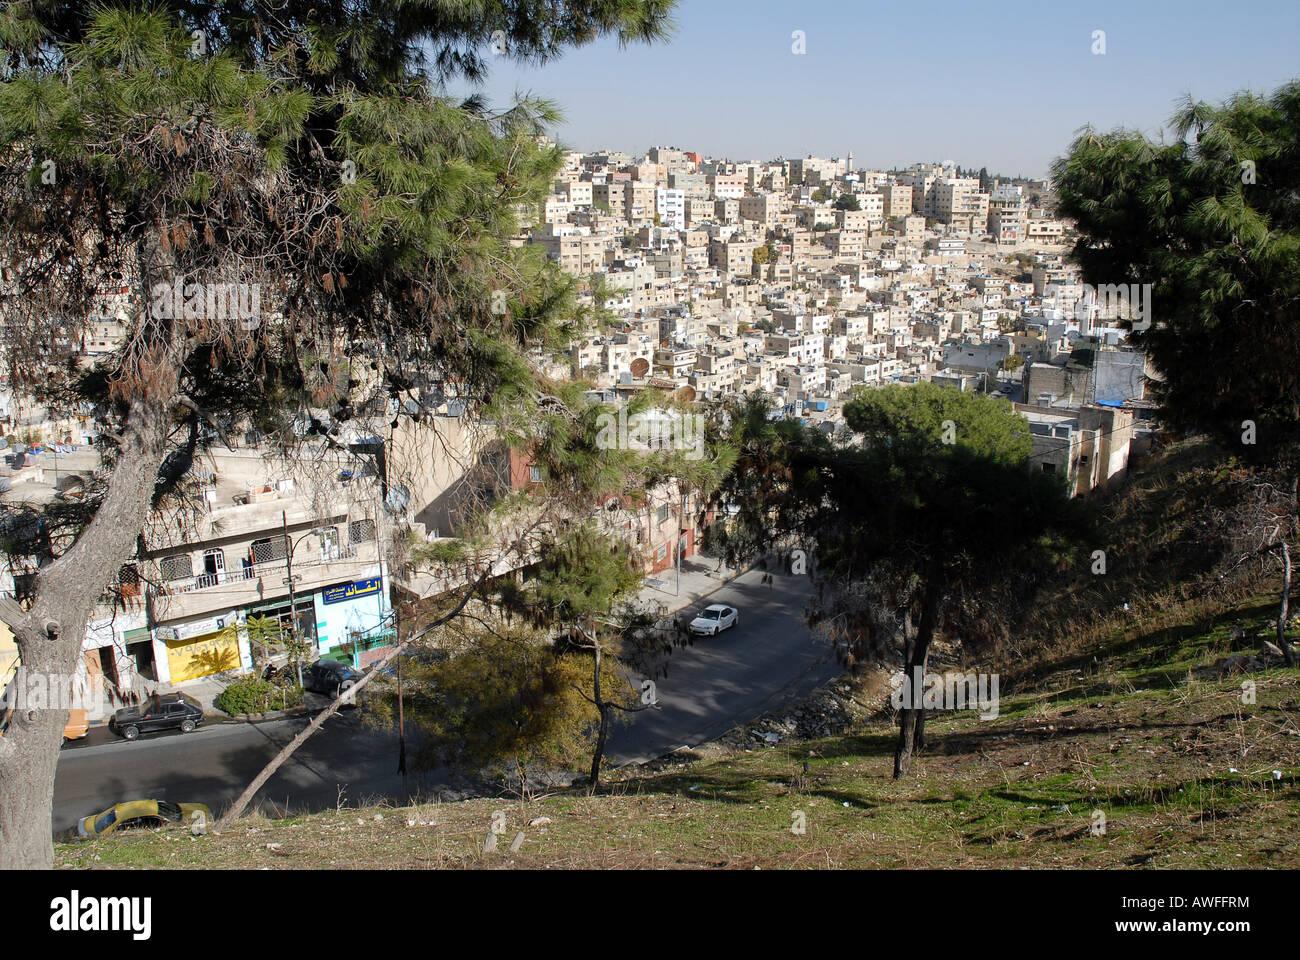 View from the Citadel, Amman, Jordan Stock Photo